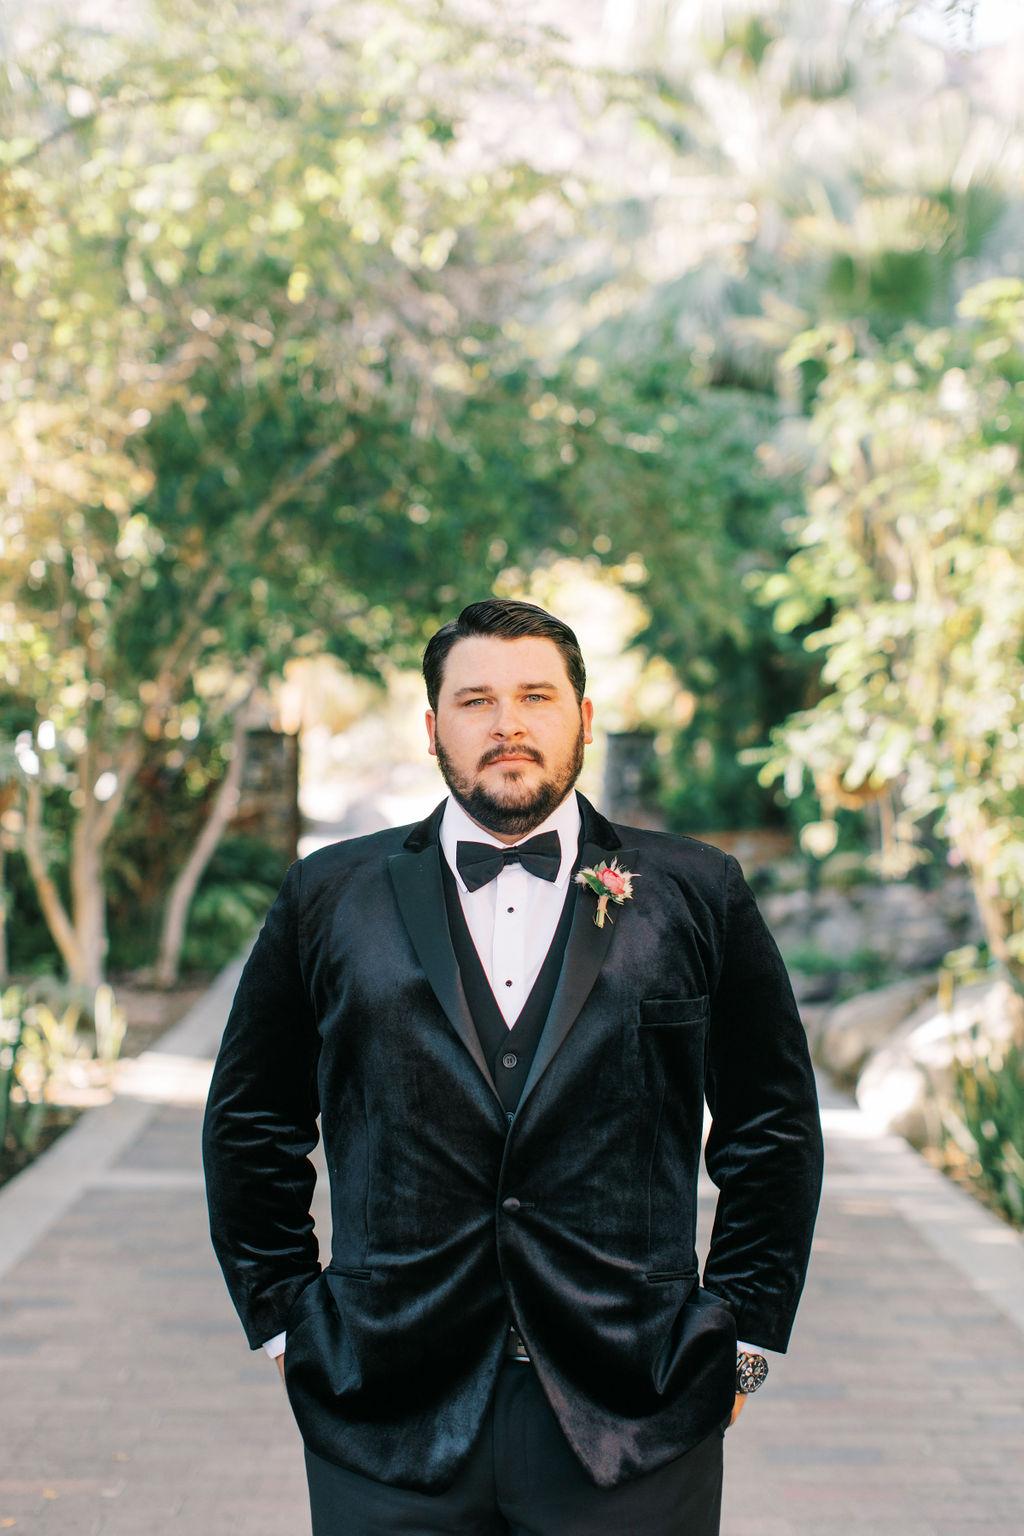 meagan robert wedding groom in black suit